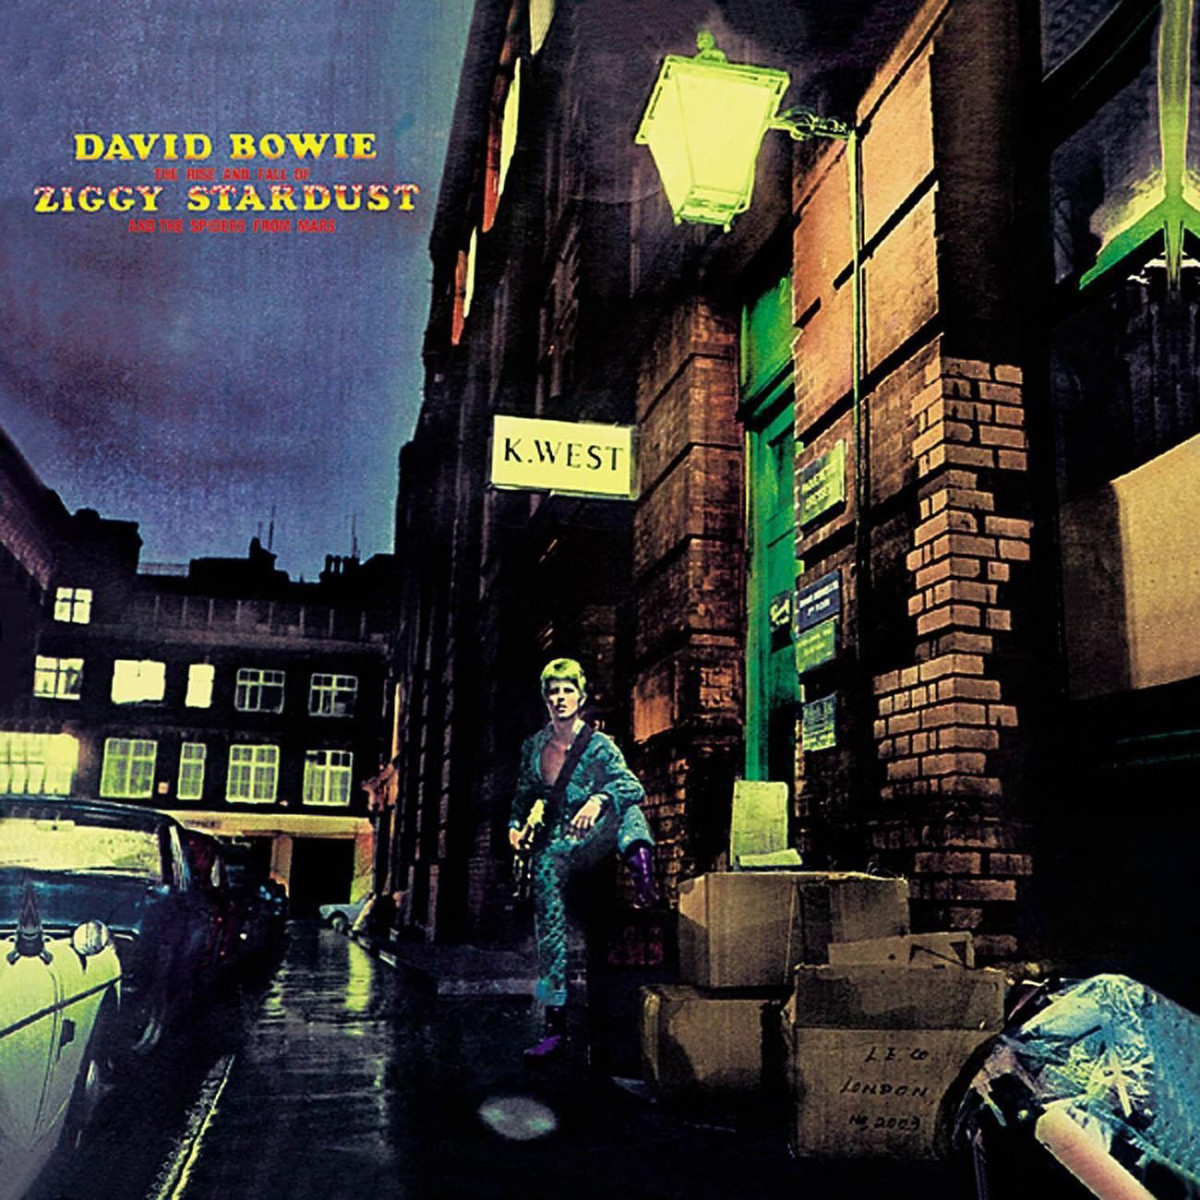 Ziggy-Stardust-Cover copy